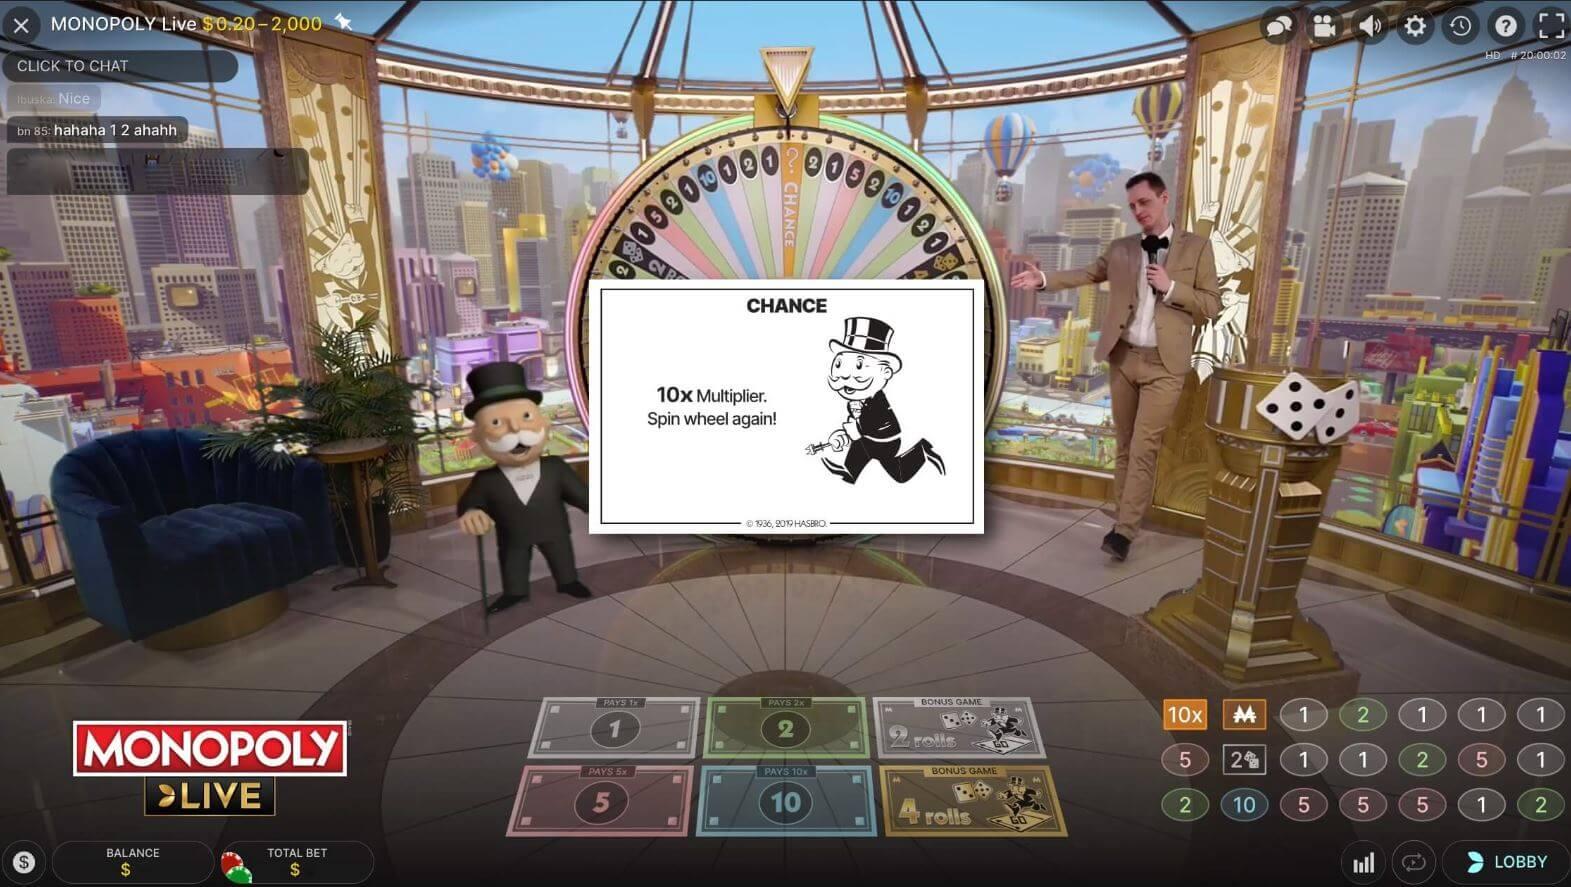 Monopoly Live chance kaartt minified